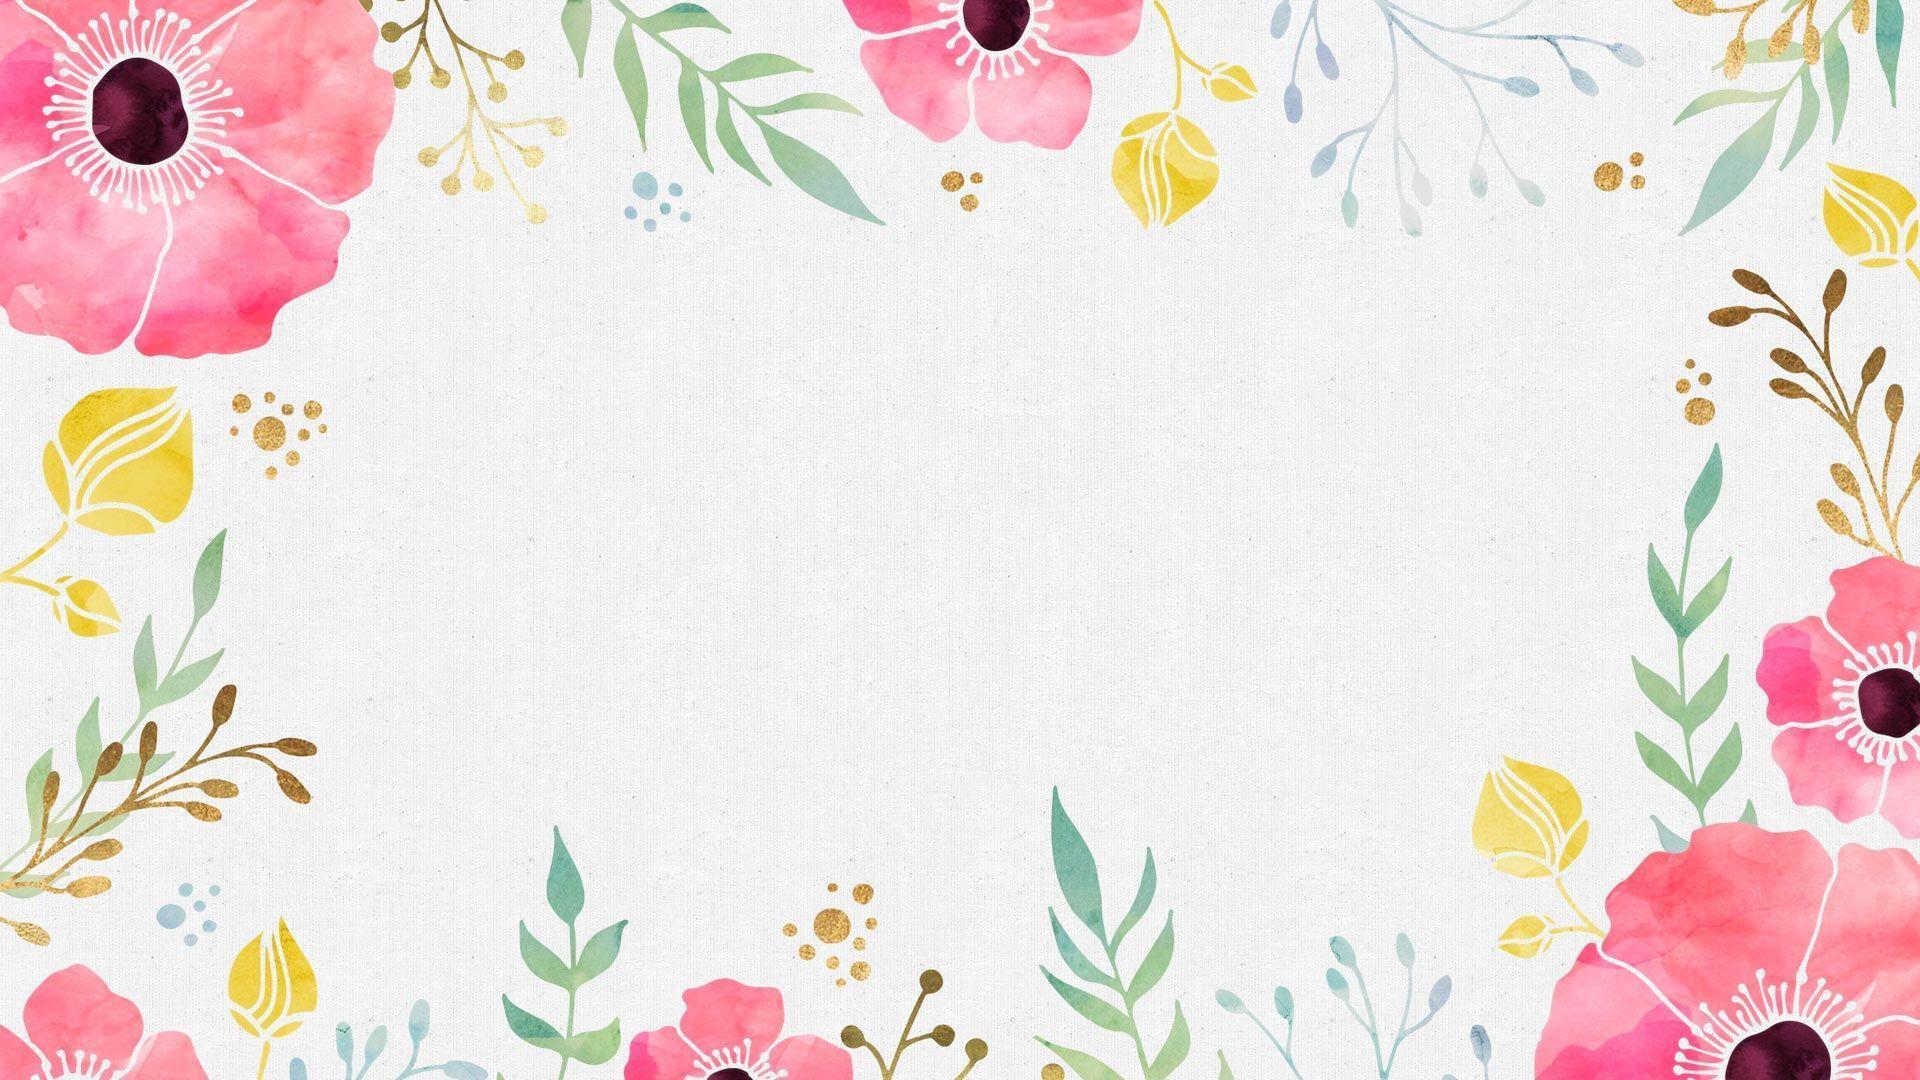 Watercolor Floral Desktop Wallpapers Top Free Watercolor Floral Desktop Backgrounds Wallpaperaccess